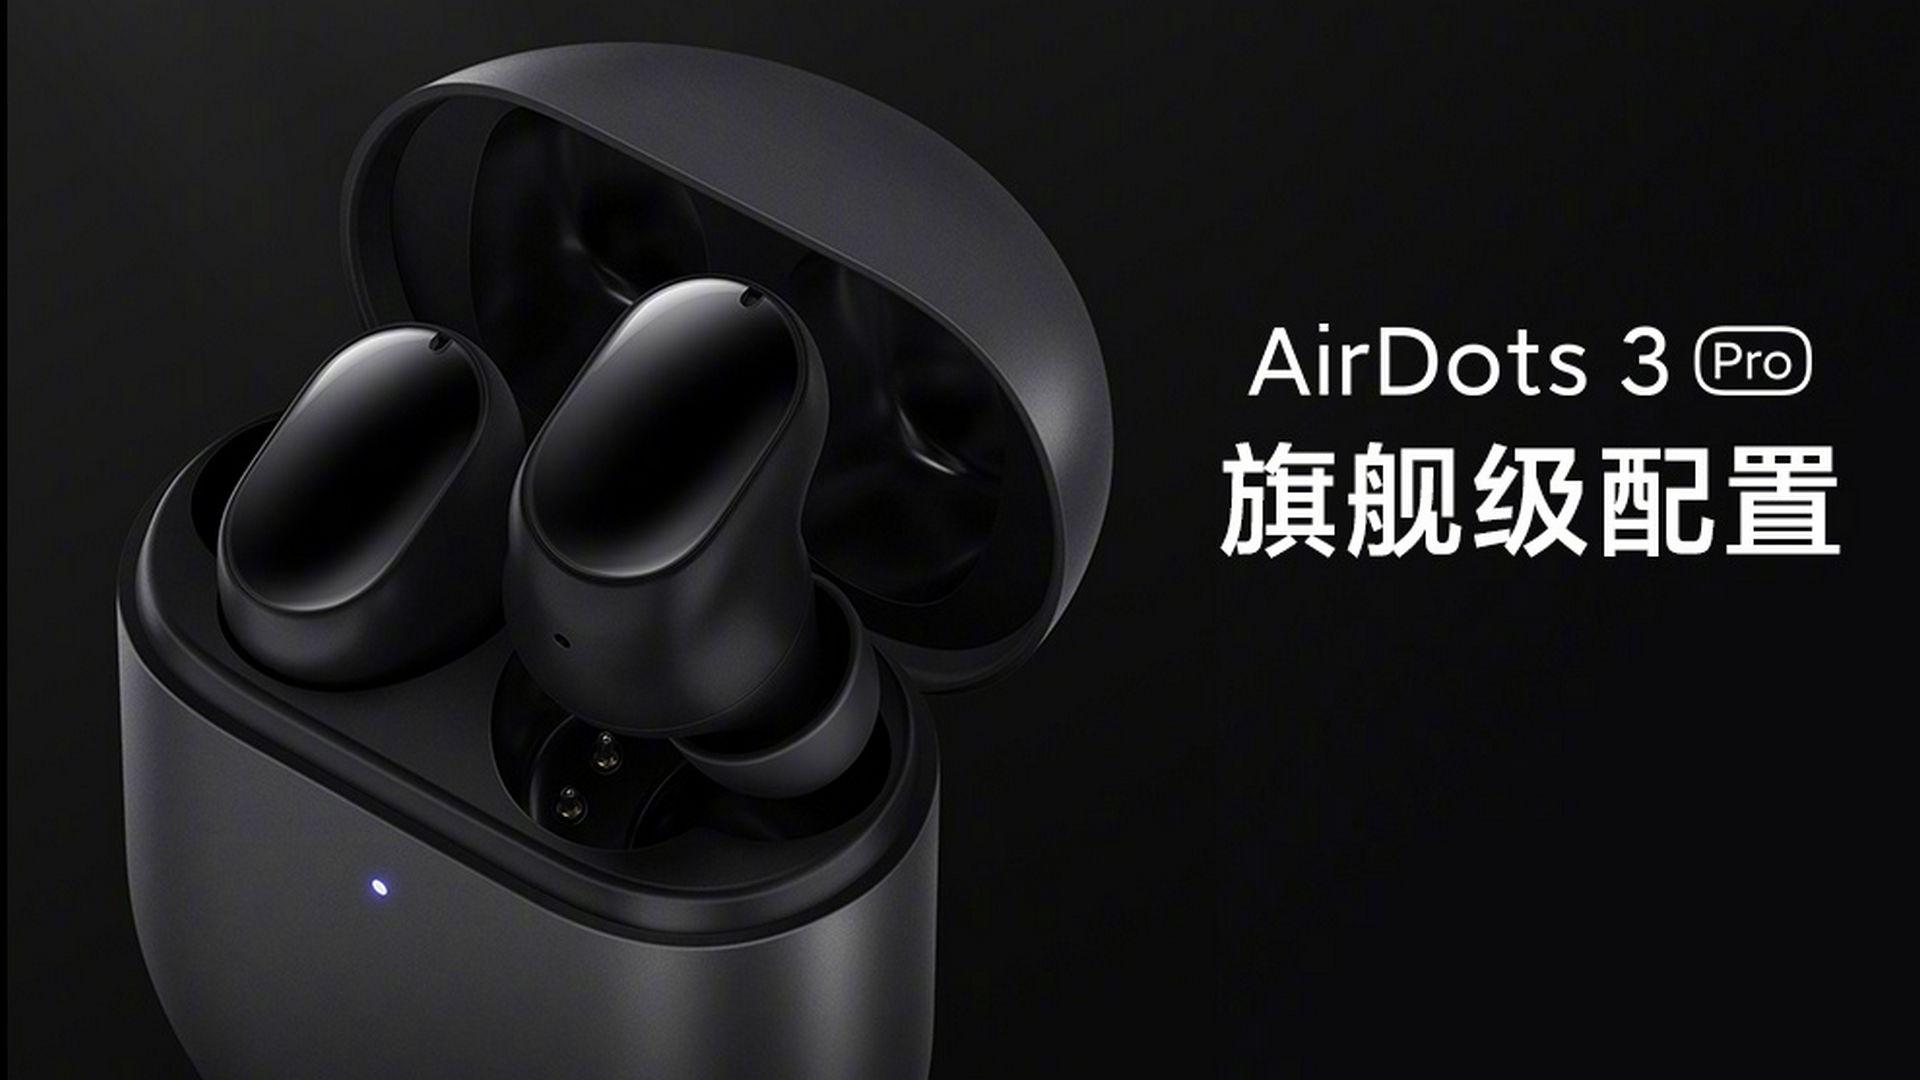 Redmi AirDots 3 Pro   AliExpress